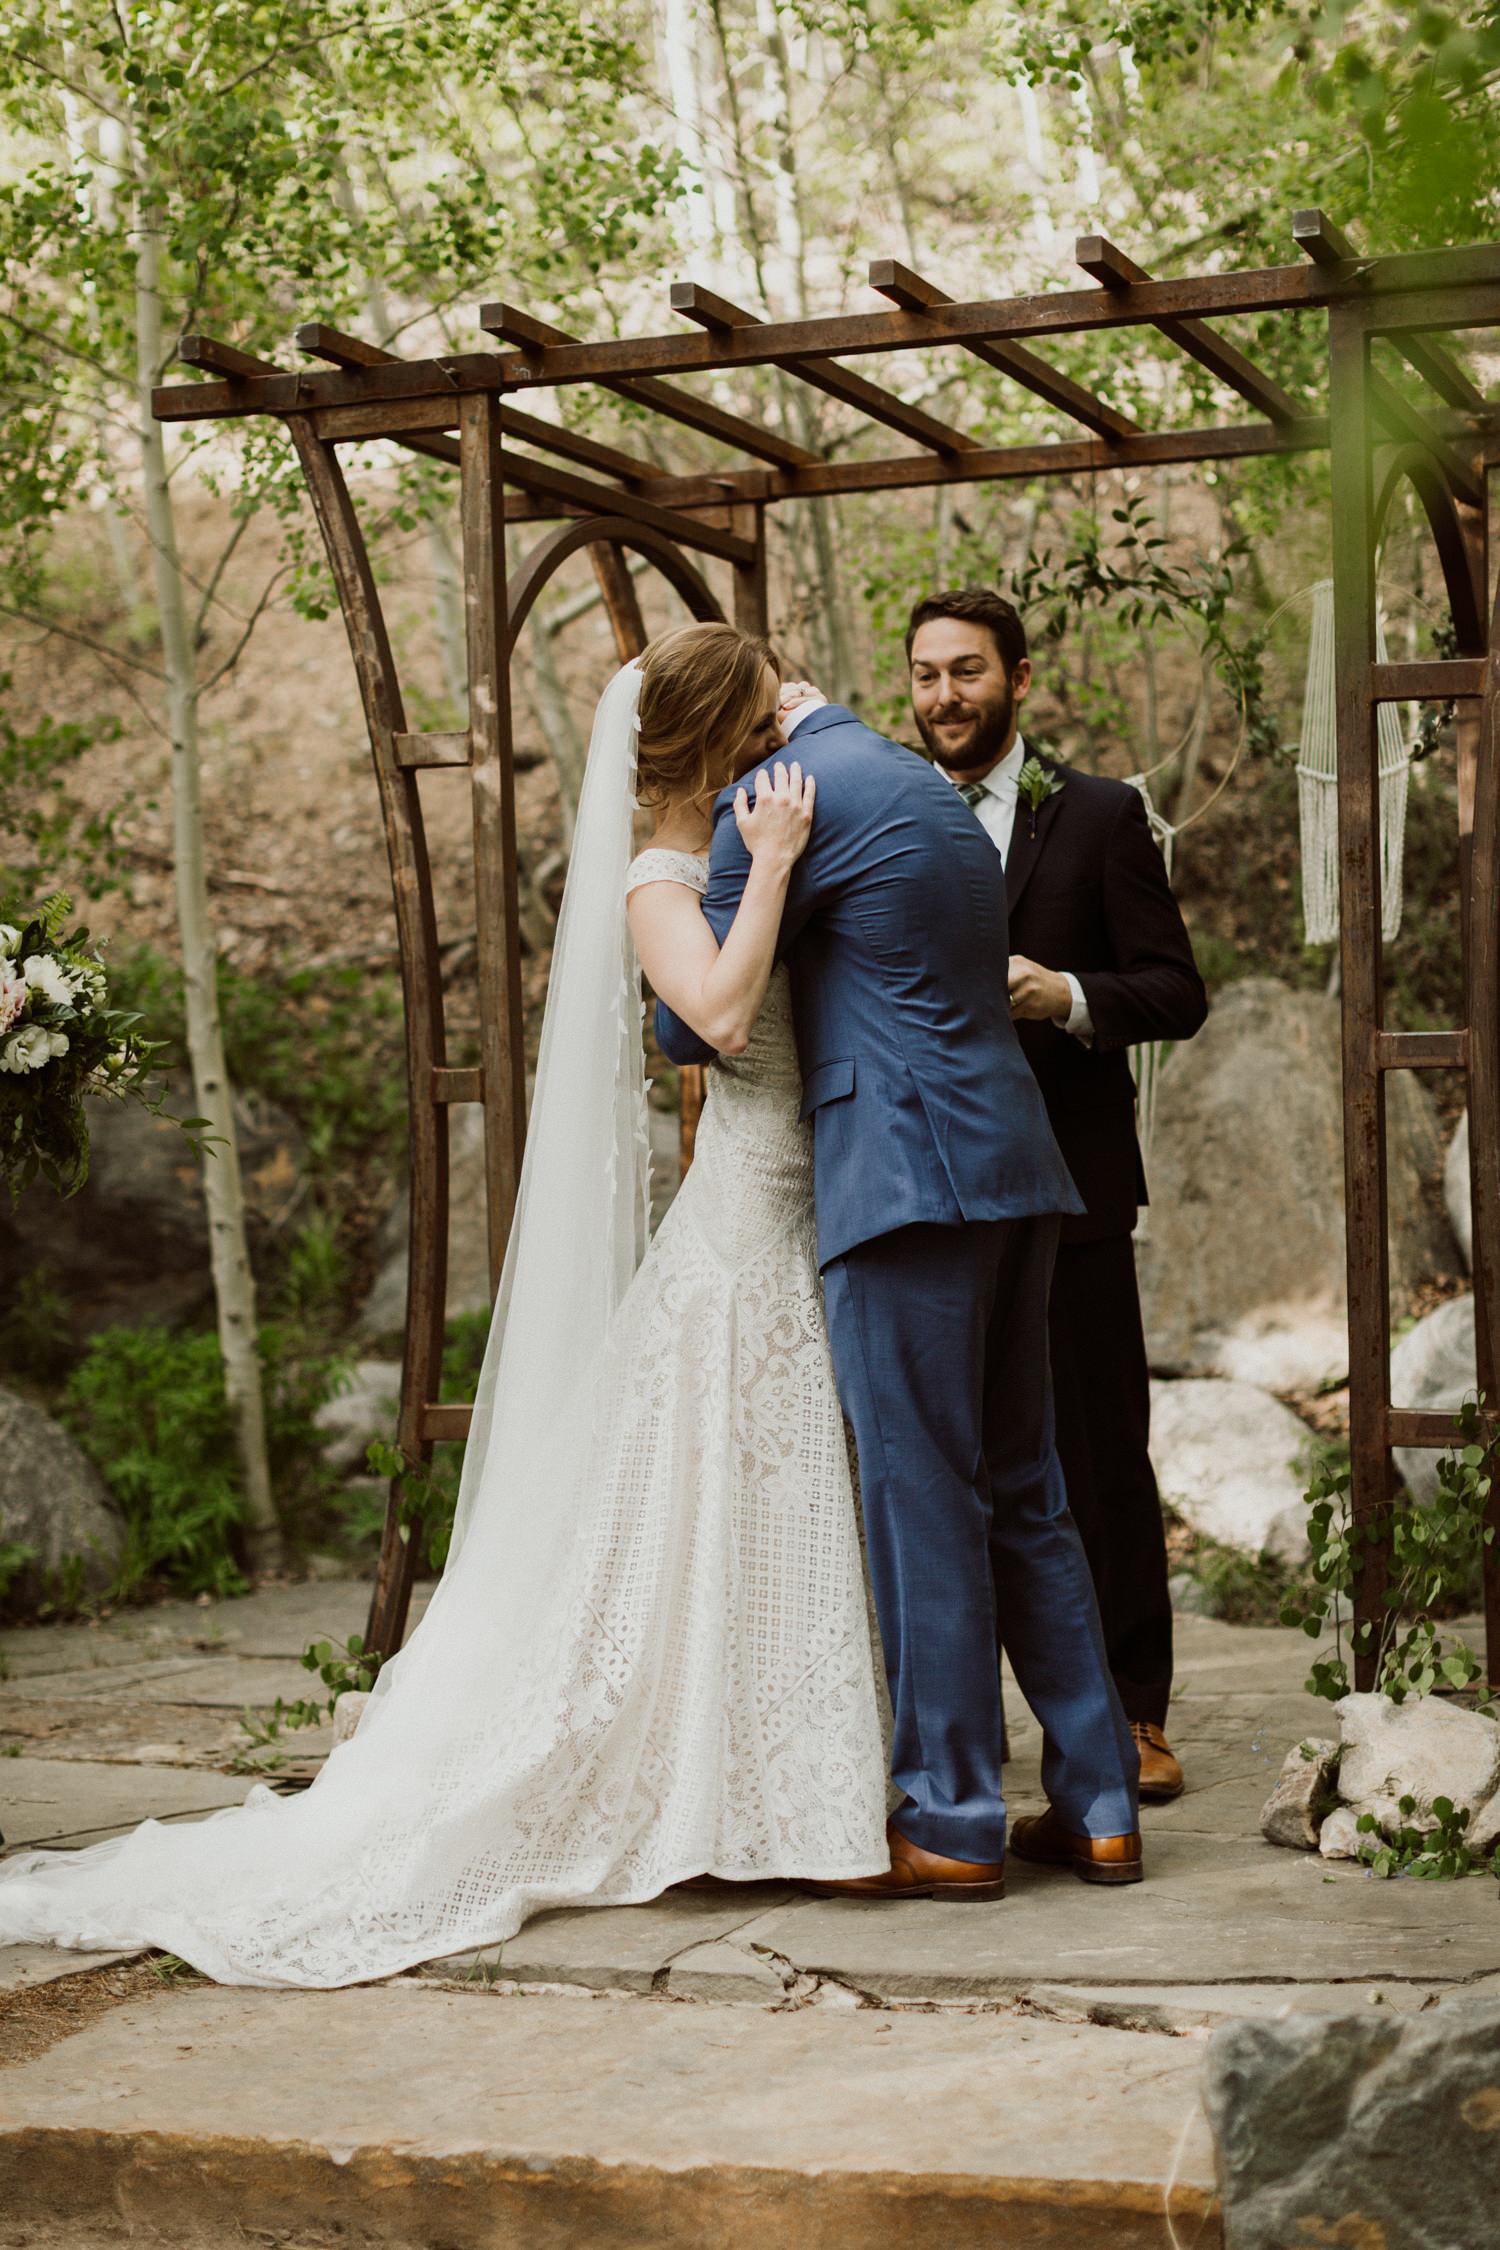 bohemian-backyard-wedding-breckenridge-colorado-87.jpg